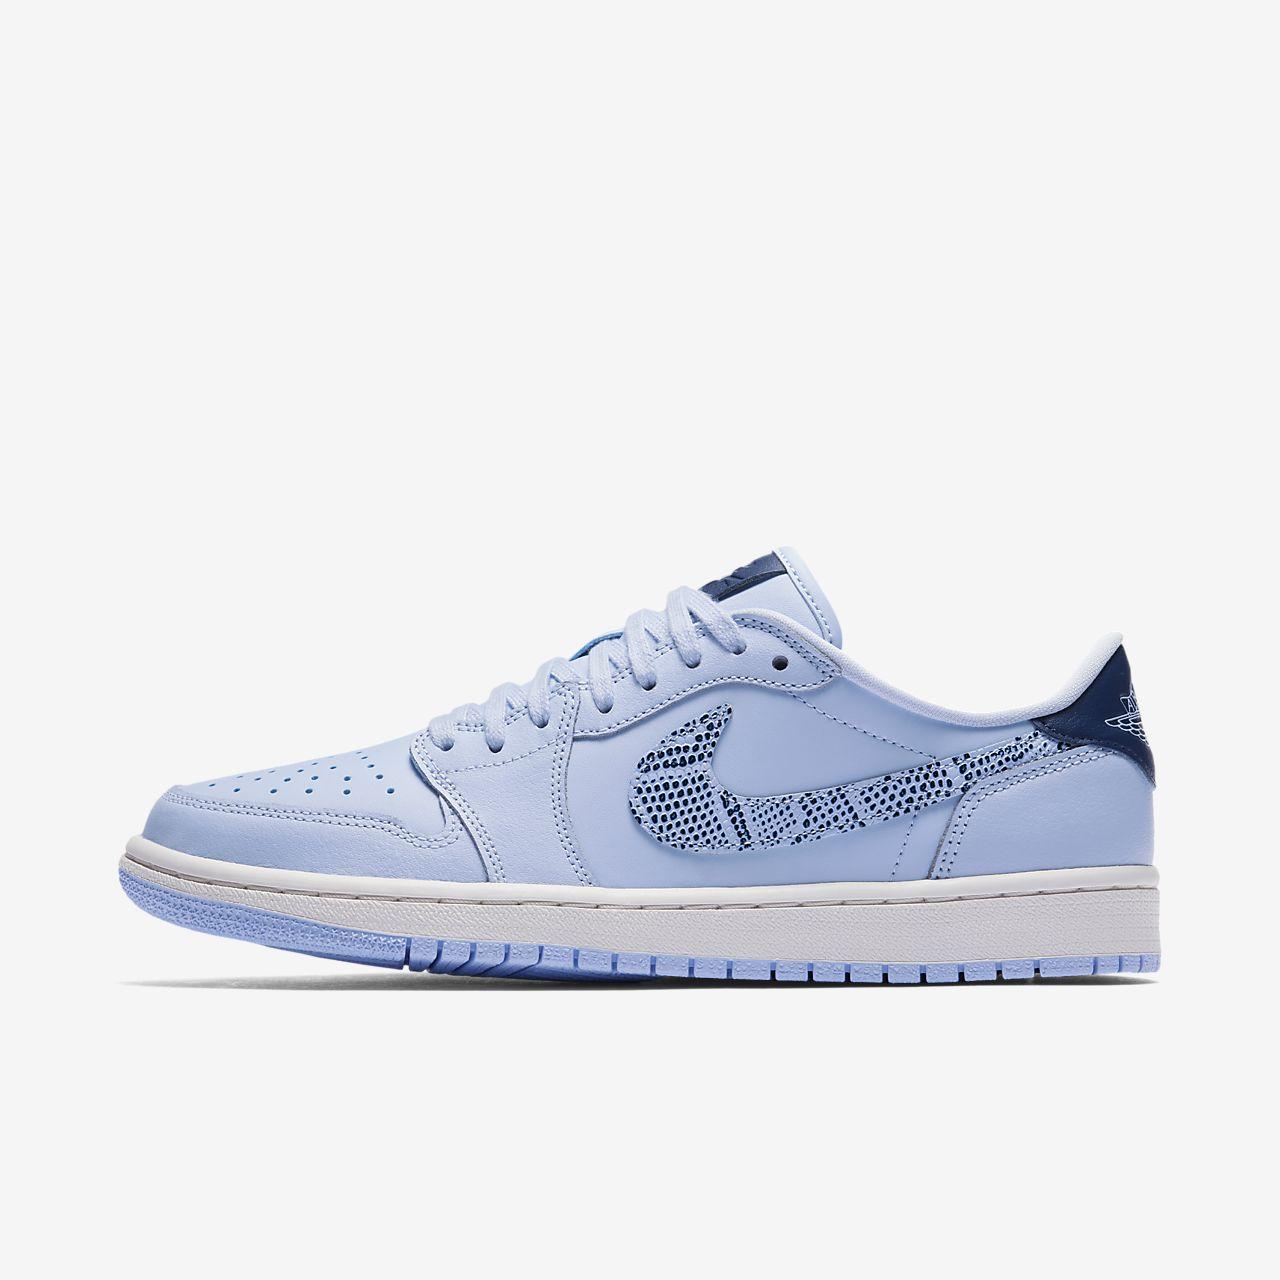 Damskie buty Air Jordan 1 Retro Low OG. Nike.com PL 0a8183a55c0